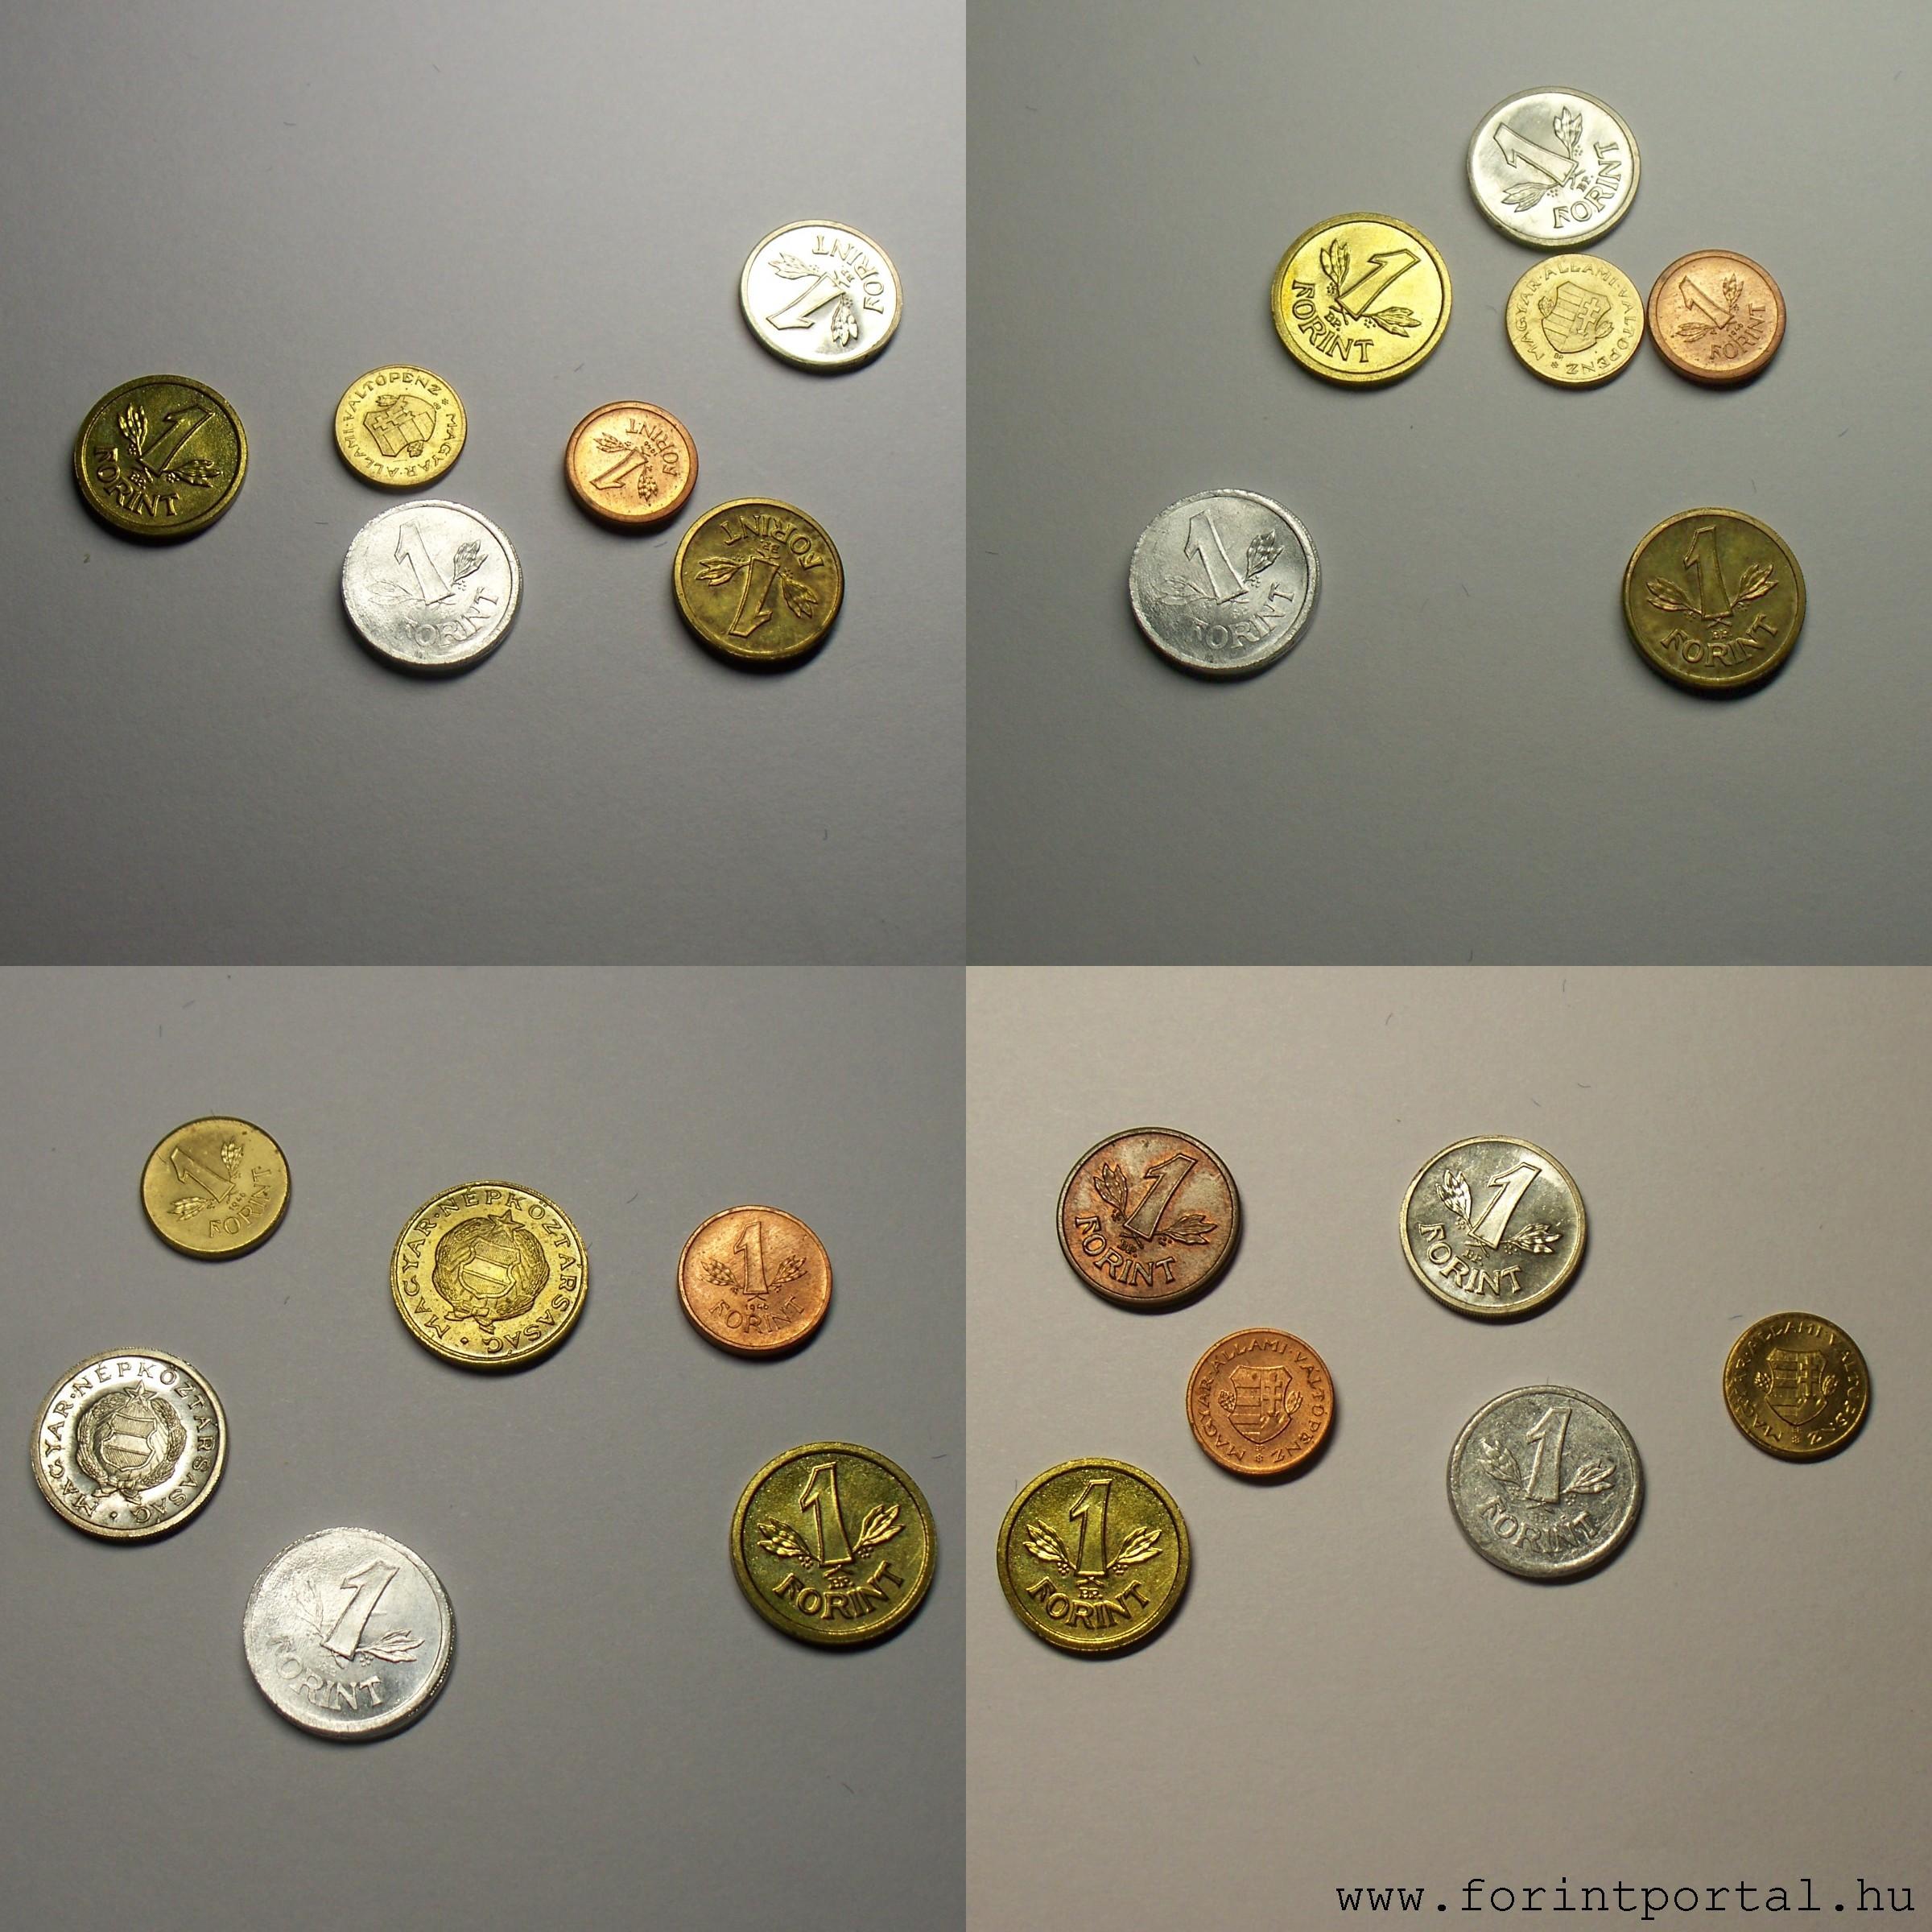 http://www.forintportal.hu/hirek/mini_1-forintos_ermek/mini_1-forintos_ermek_lot_mindenfele.jpg